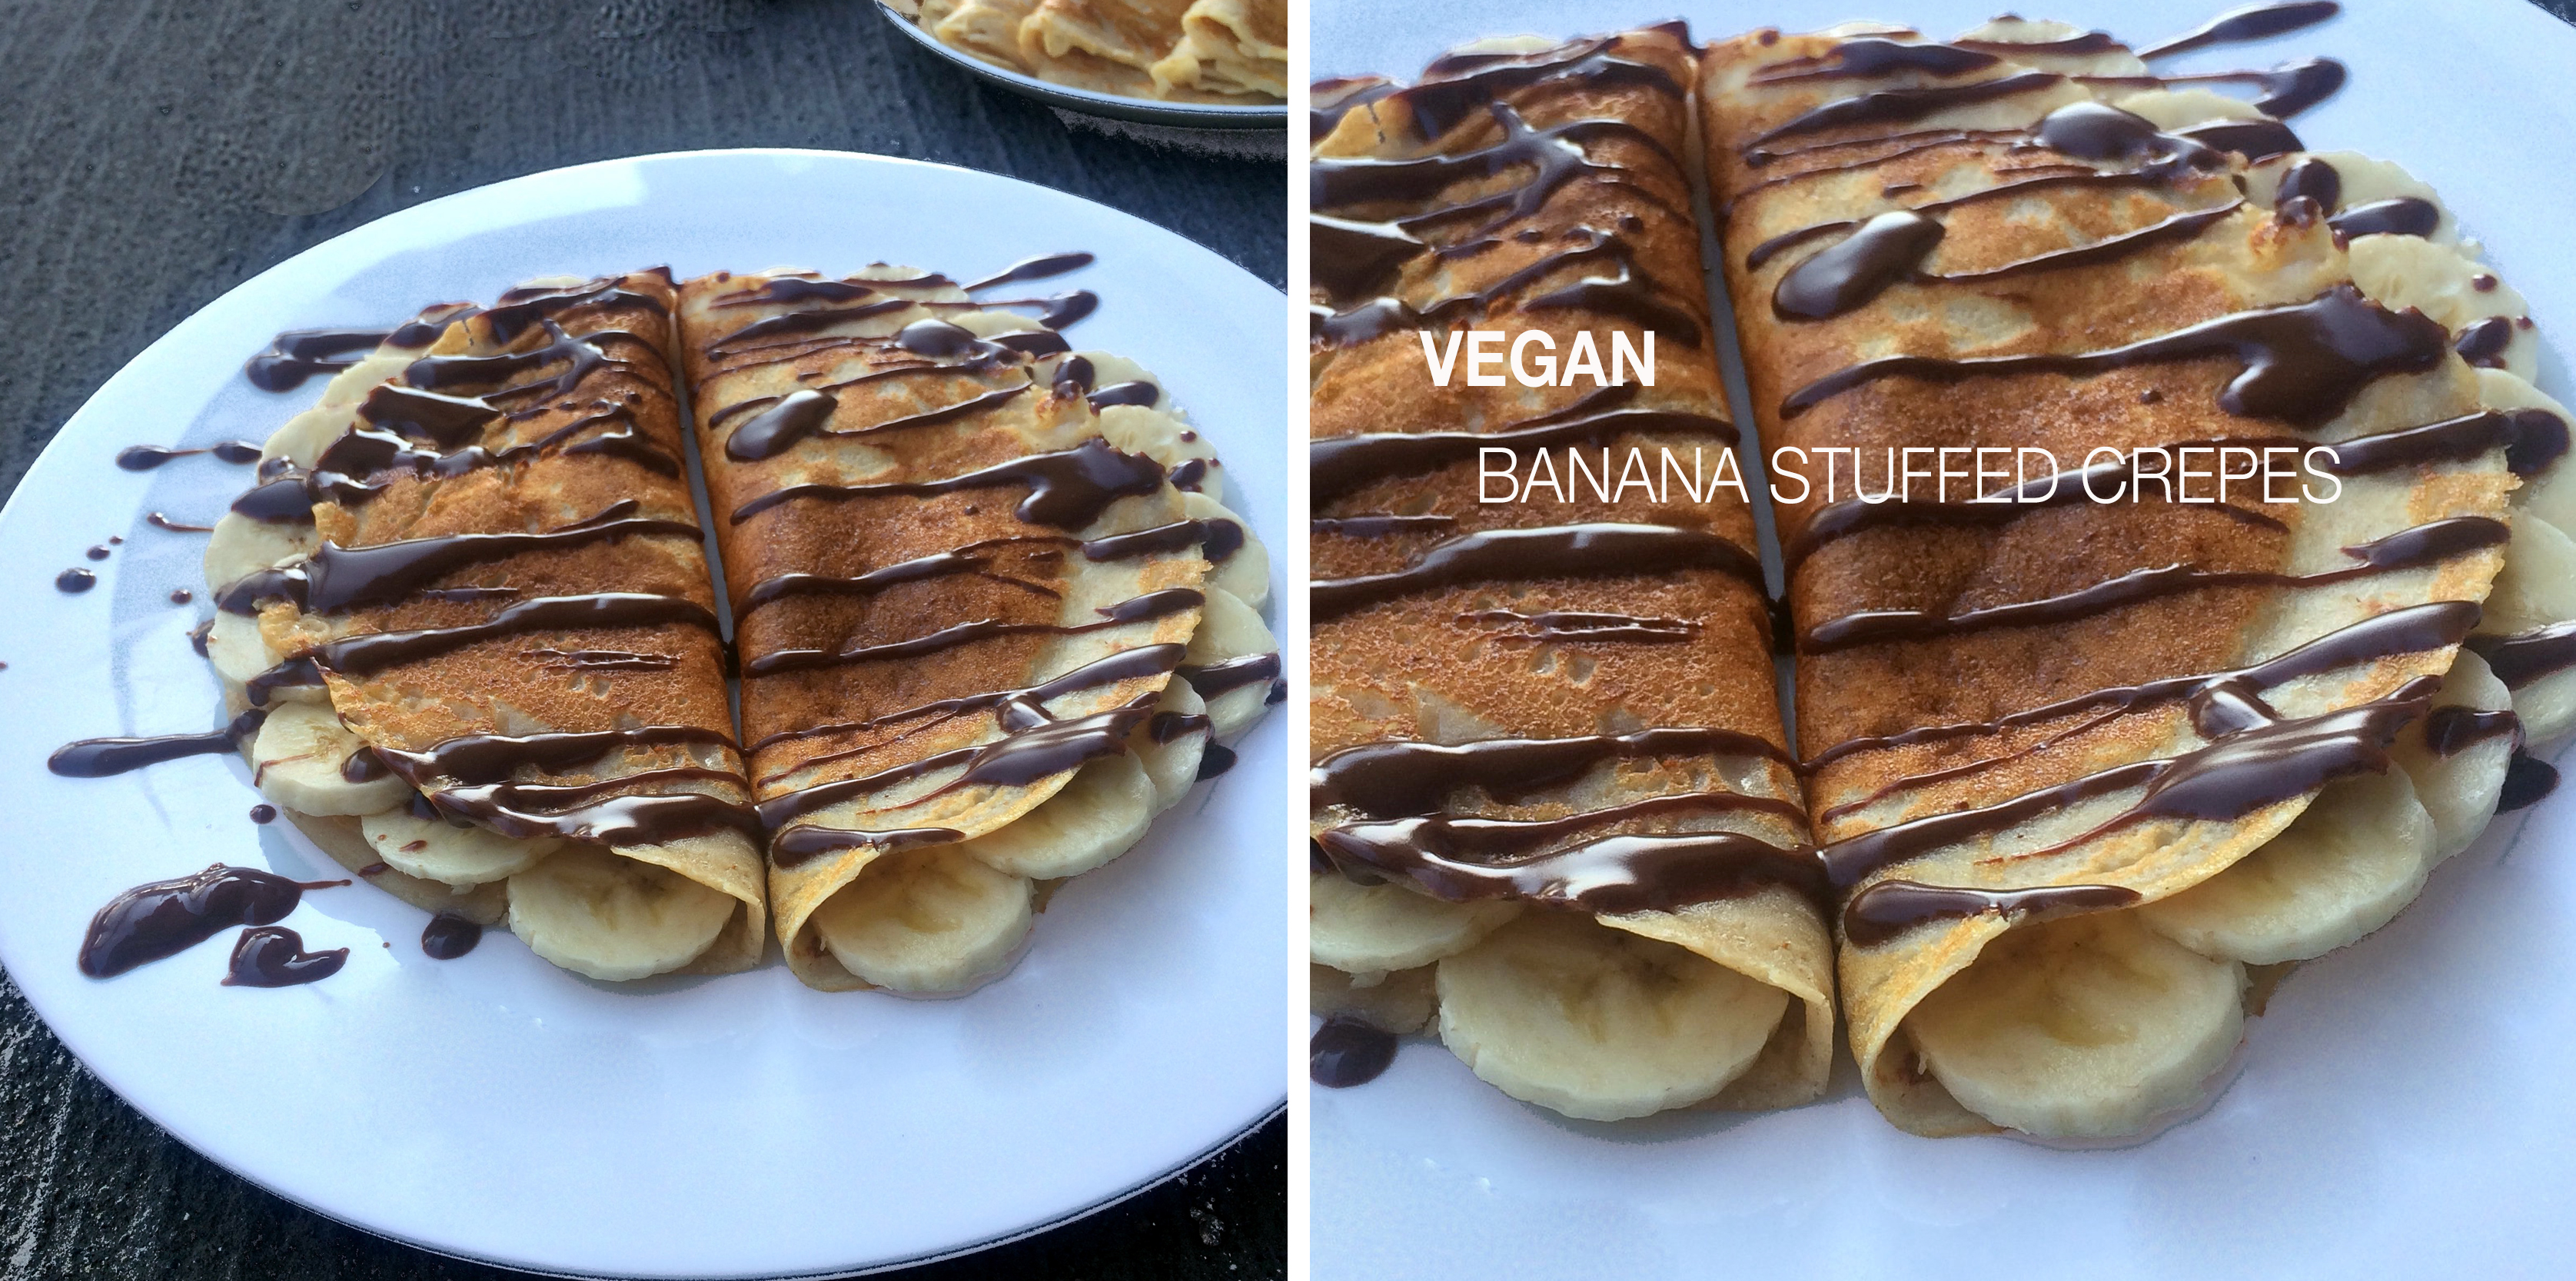 Banana stuffed vegan crepes